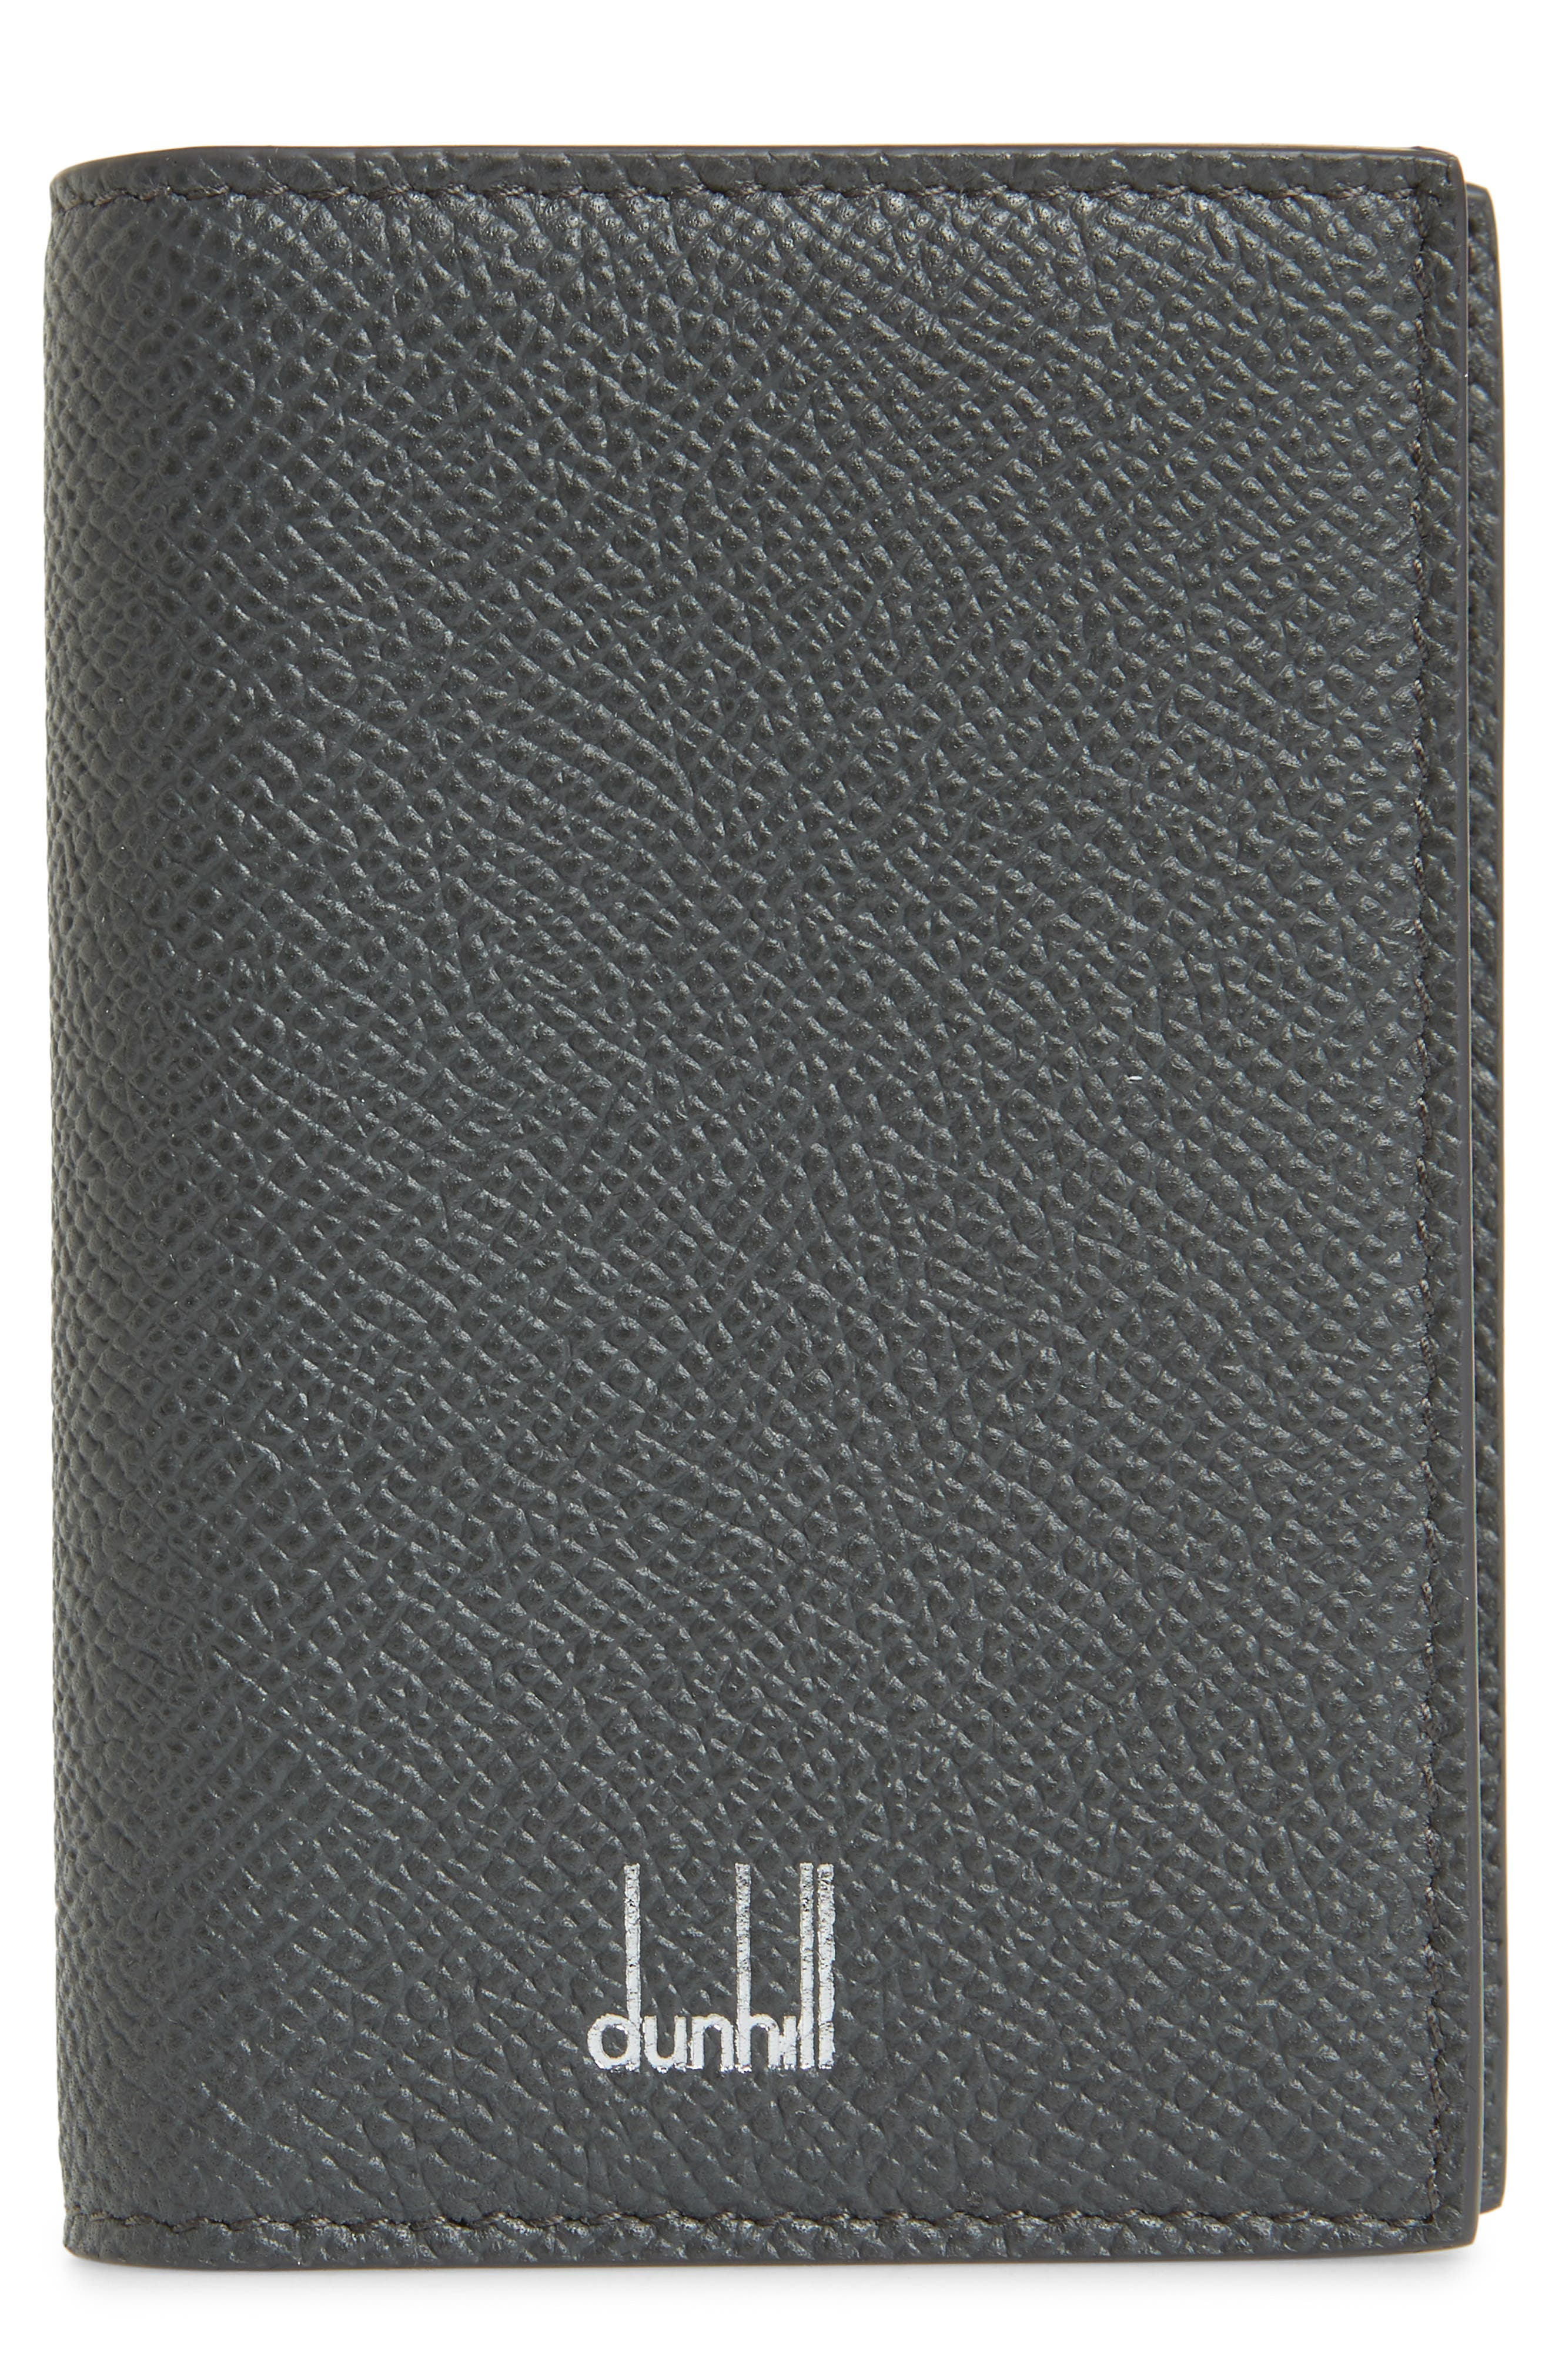 Cadogan Card Case,                             Main thumbnail 1, color,                             GREY